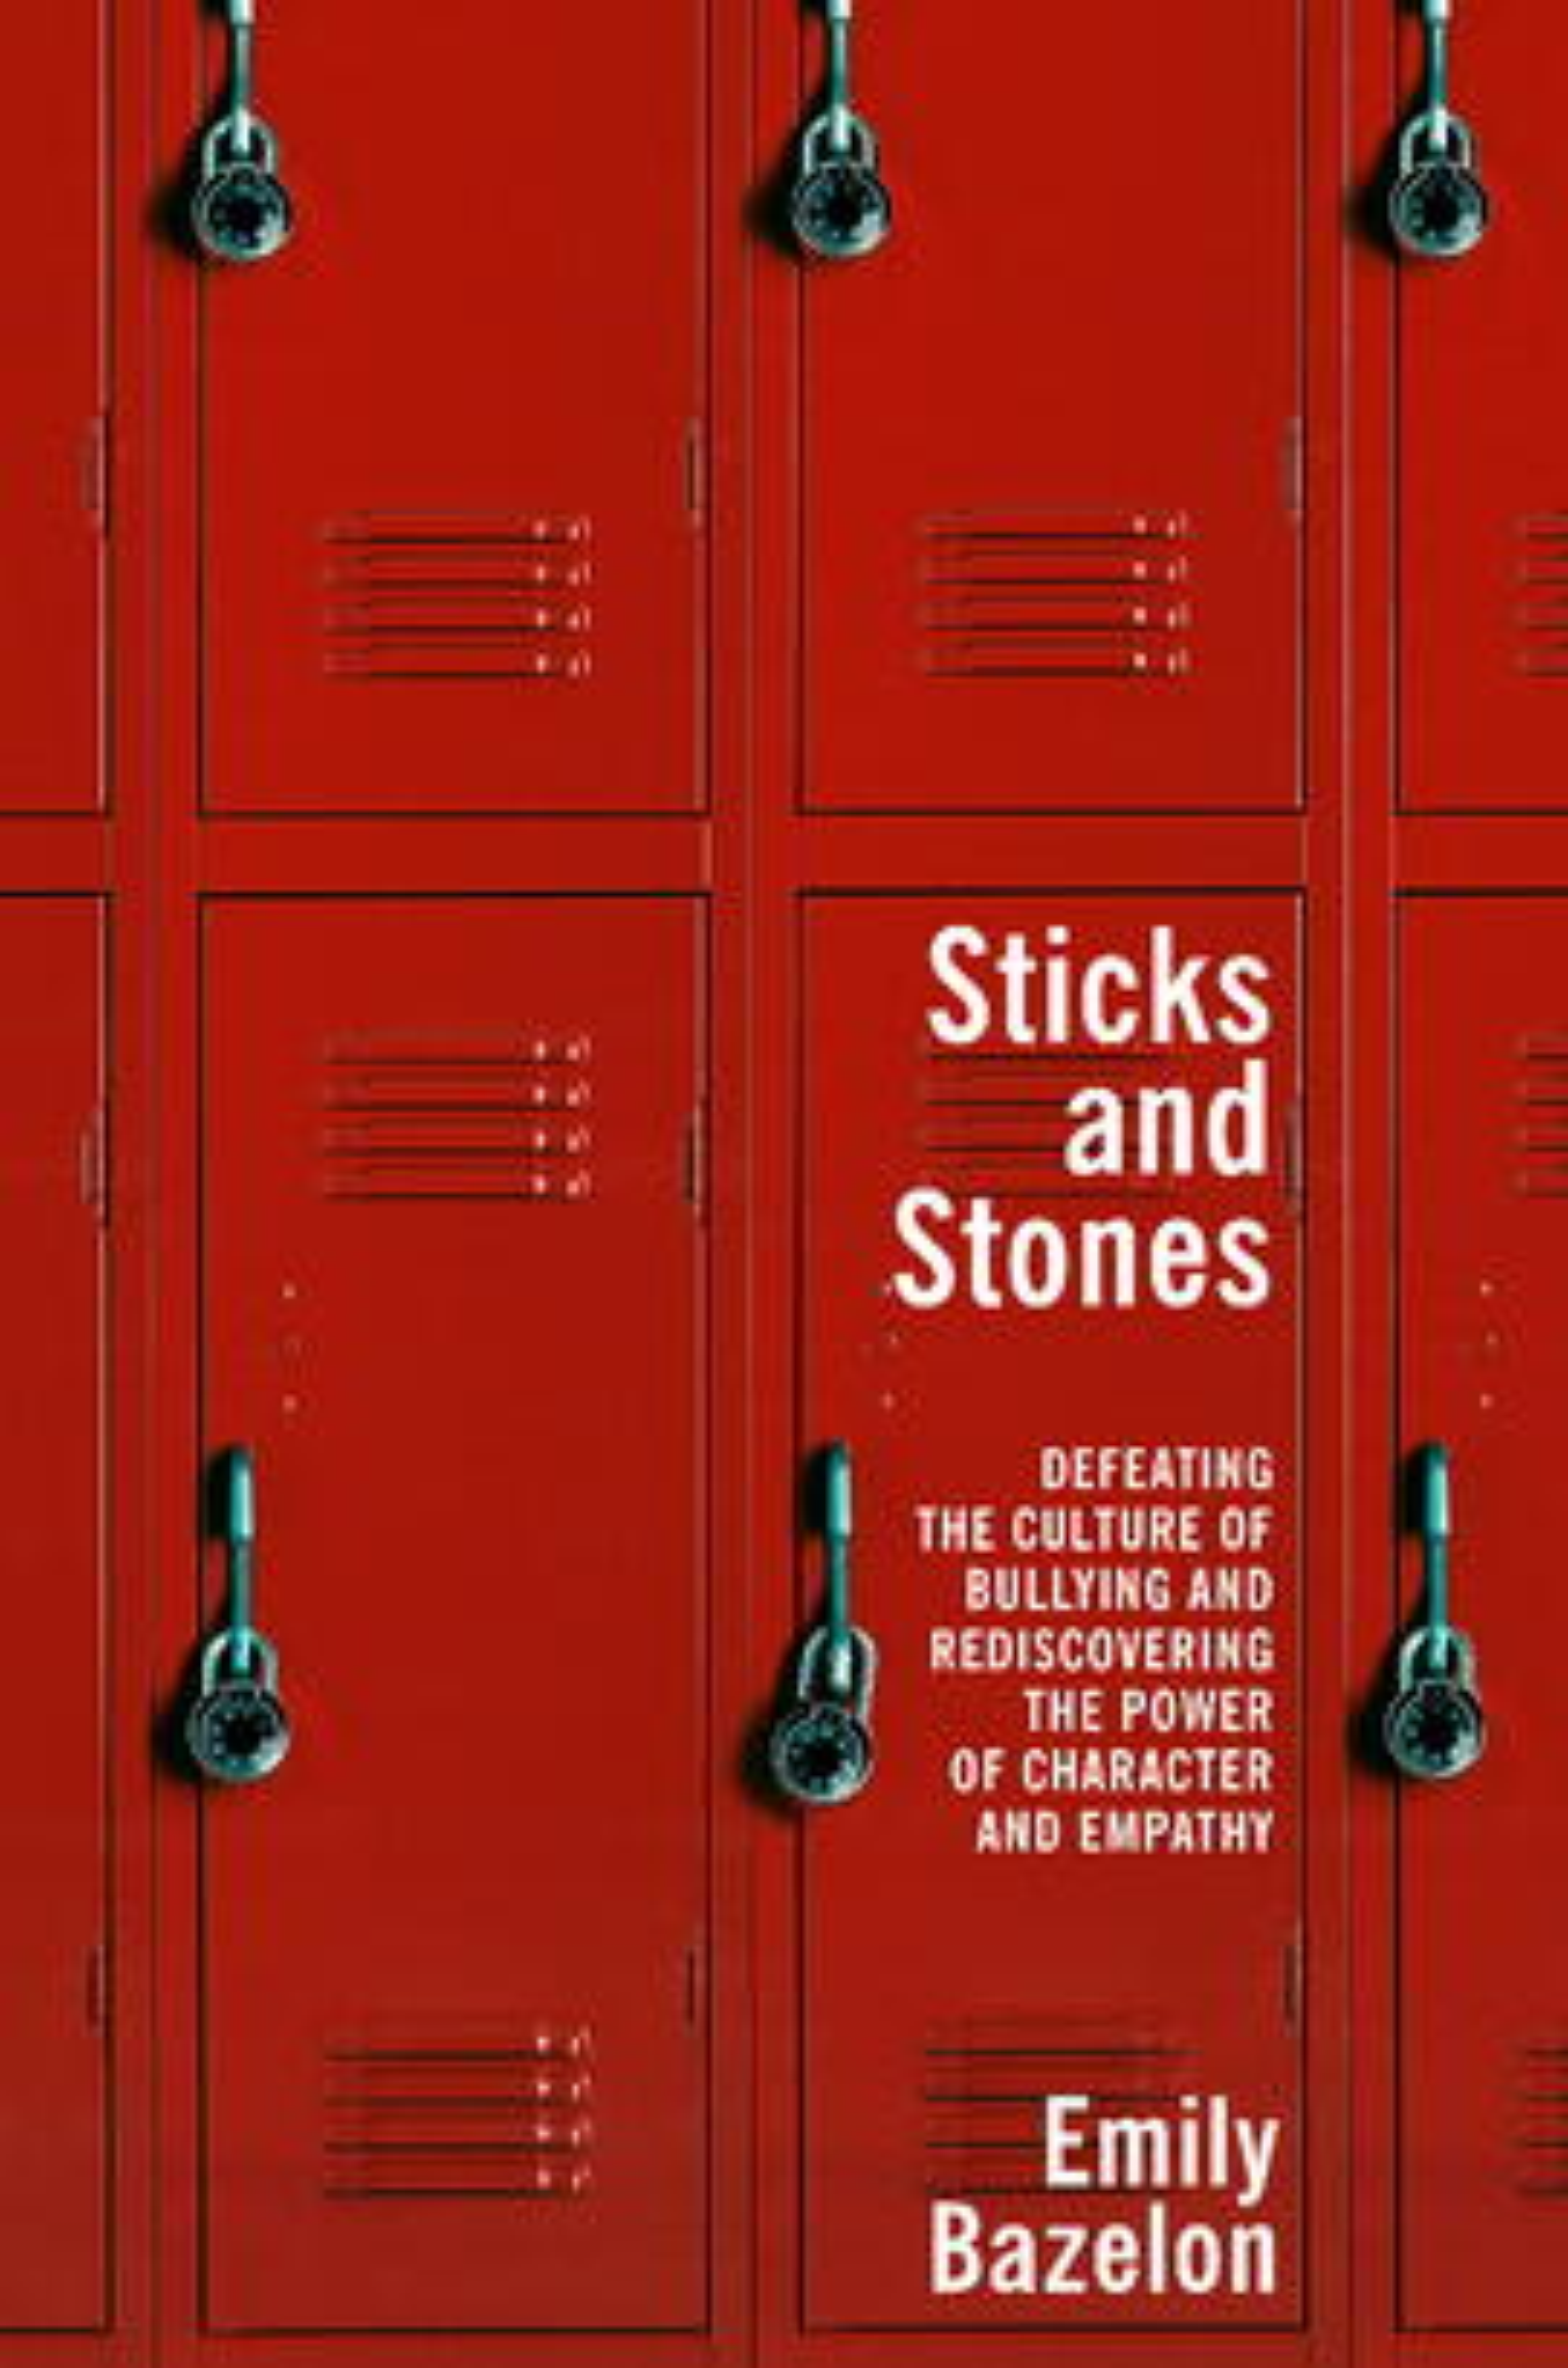 Bazelon Sticks and Stones